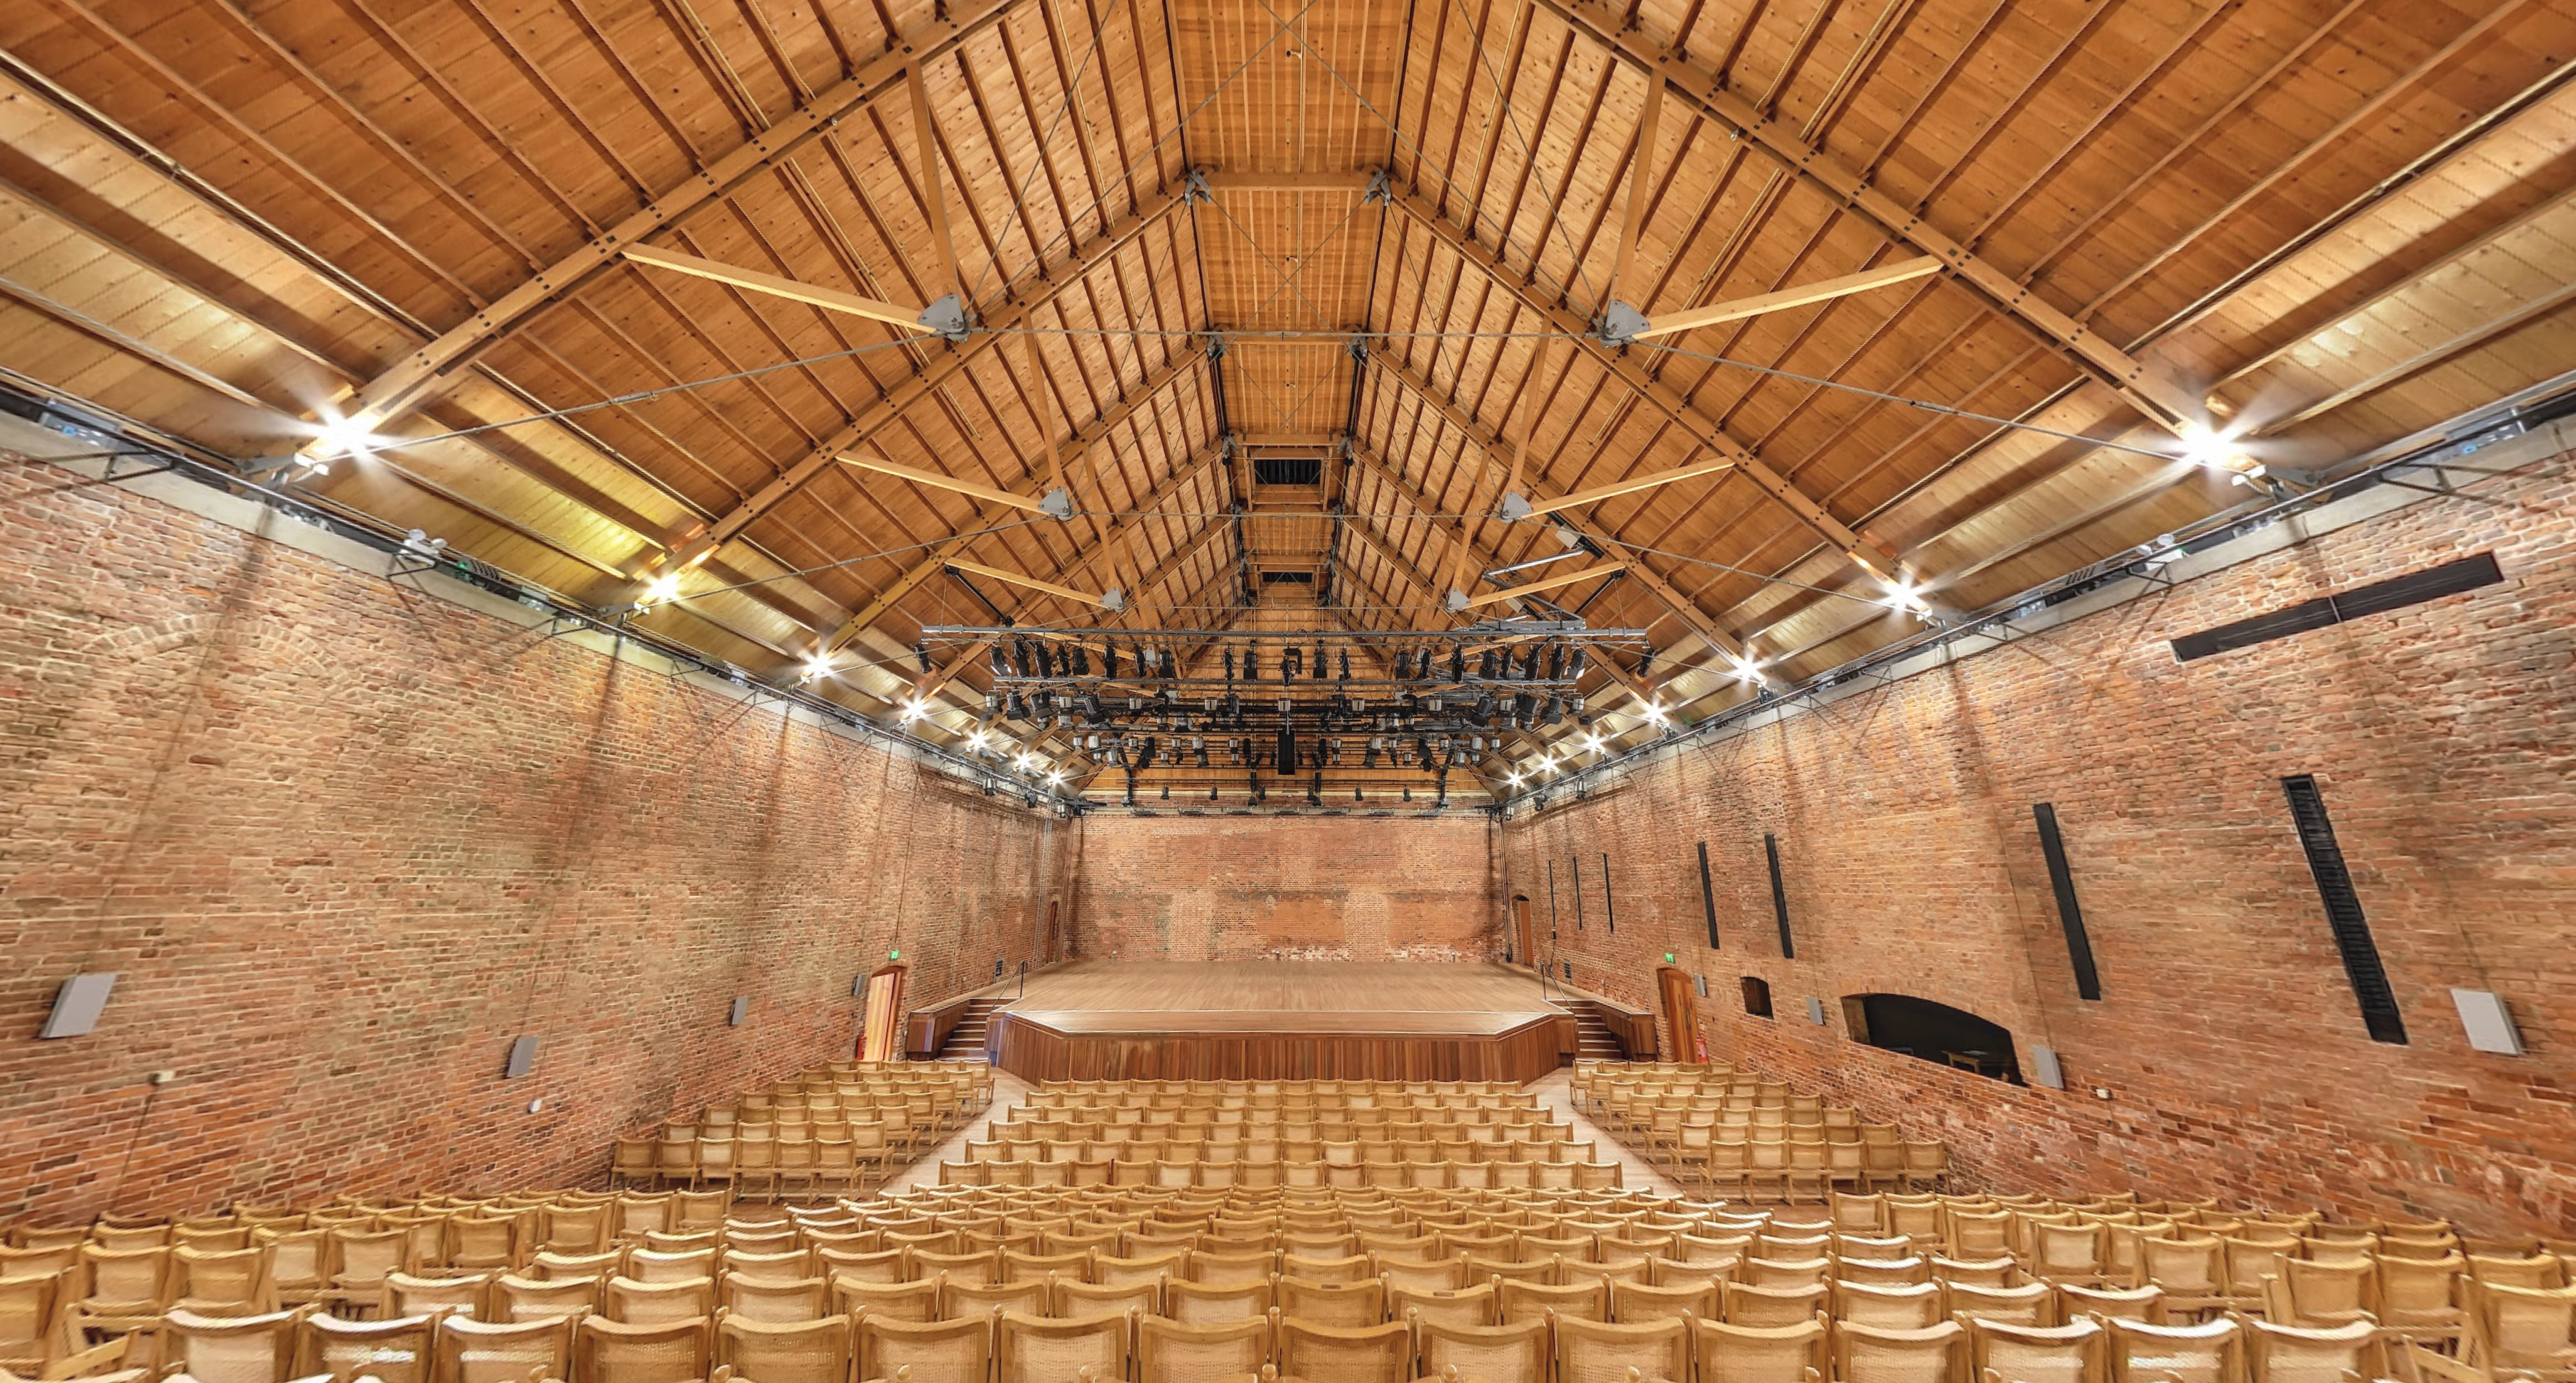 Concert Hall Tour